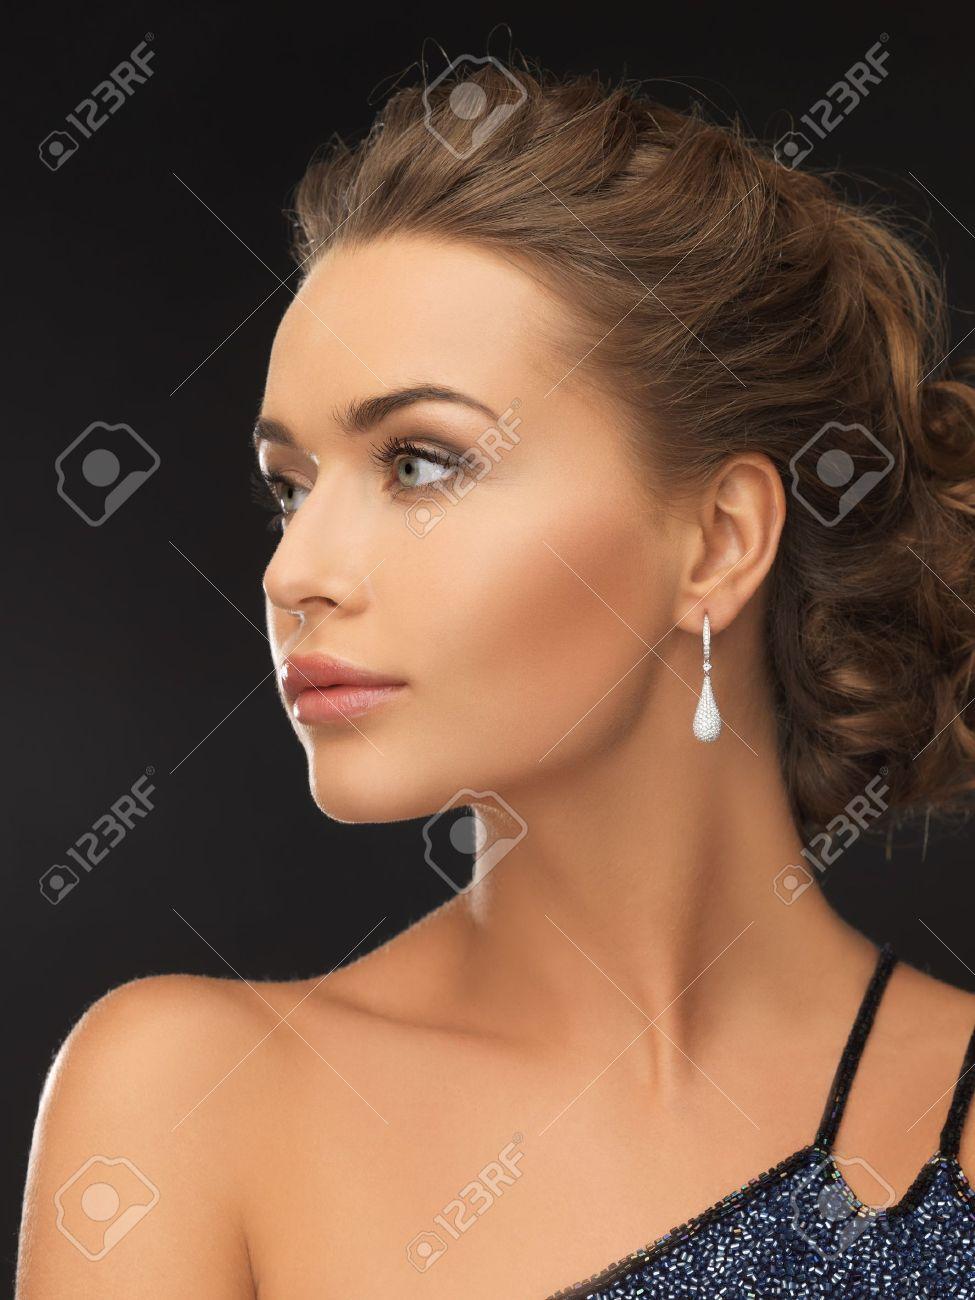 beautiful woman in evening dress wearing diamond earrings Stock Photo - 19484045